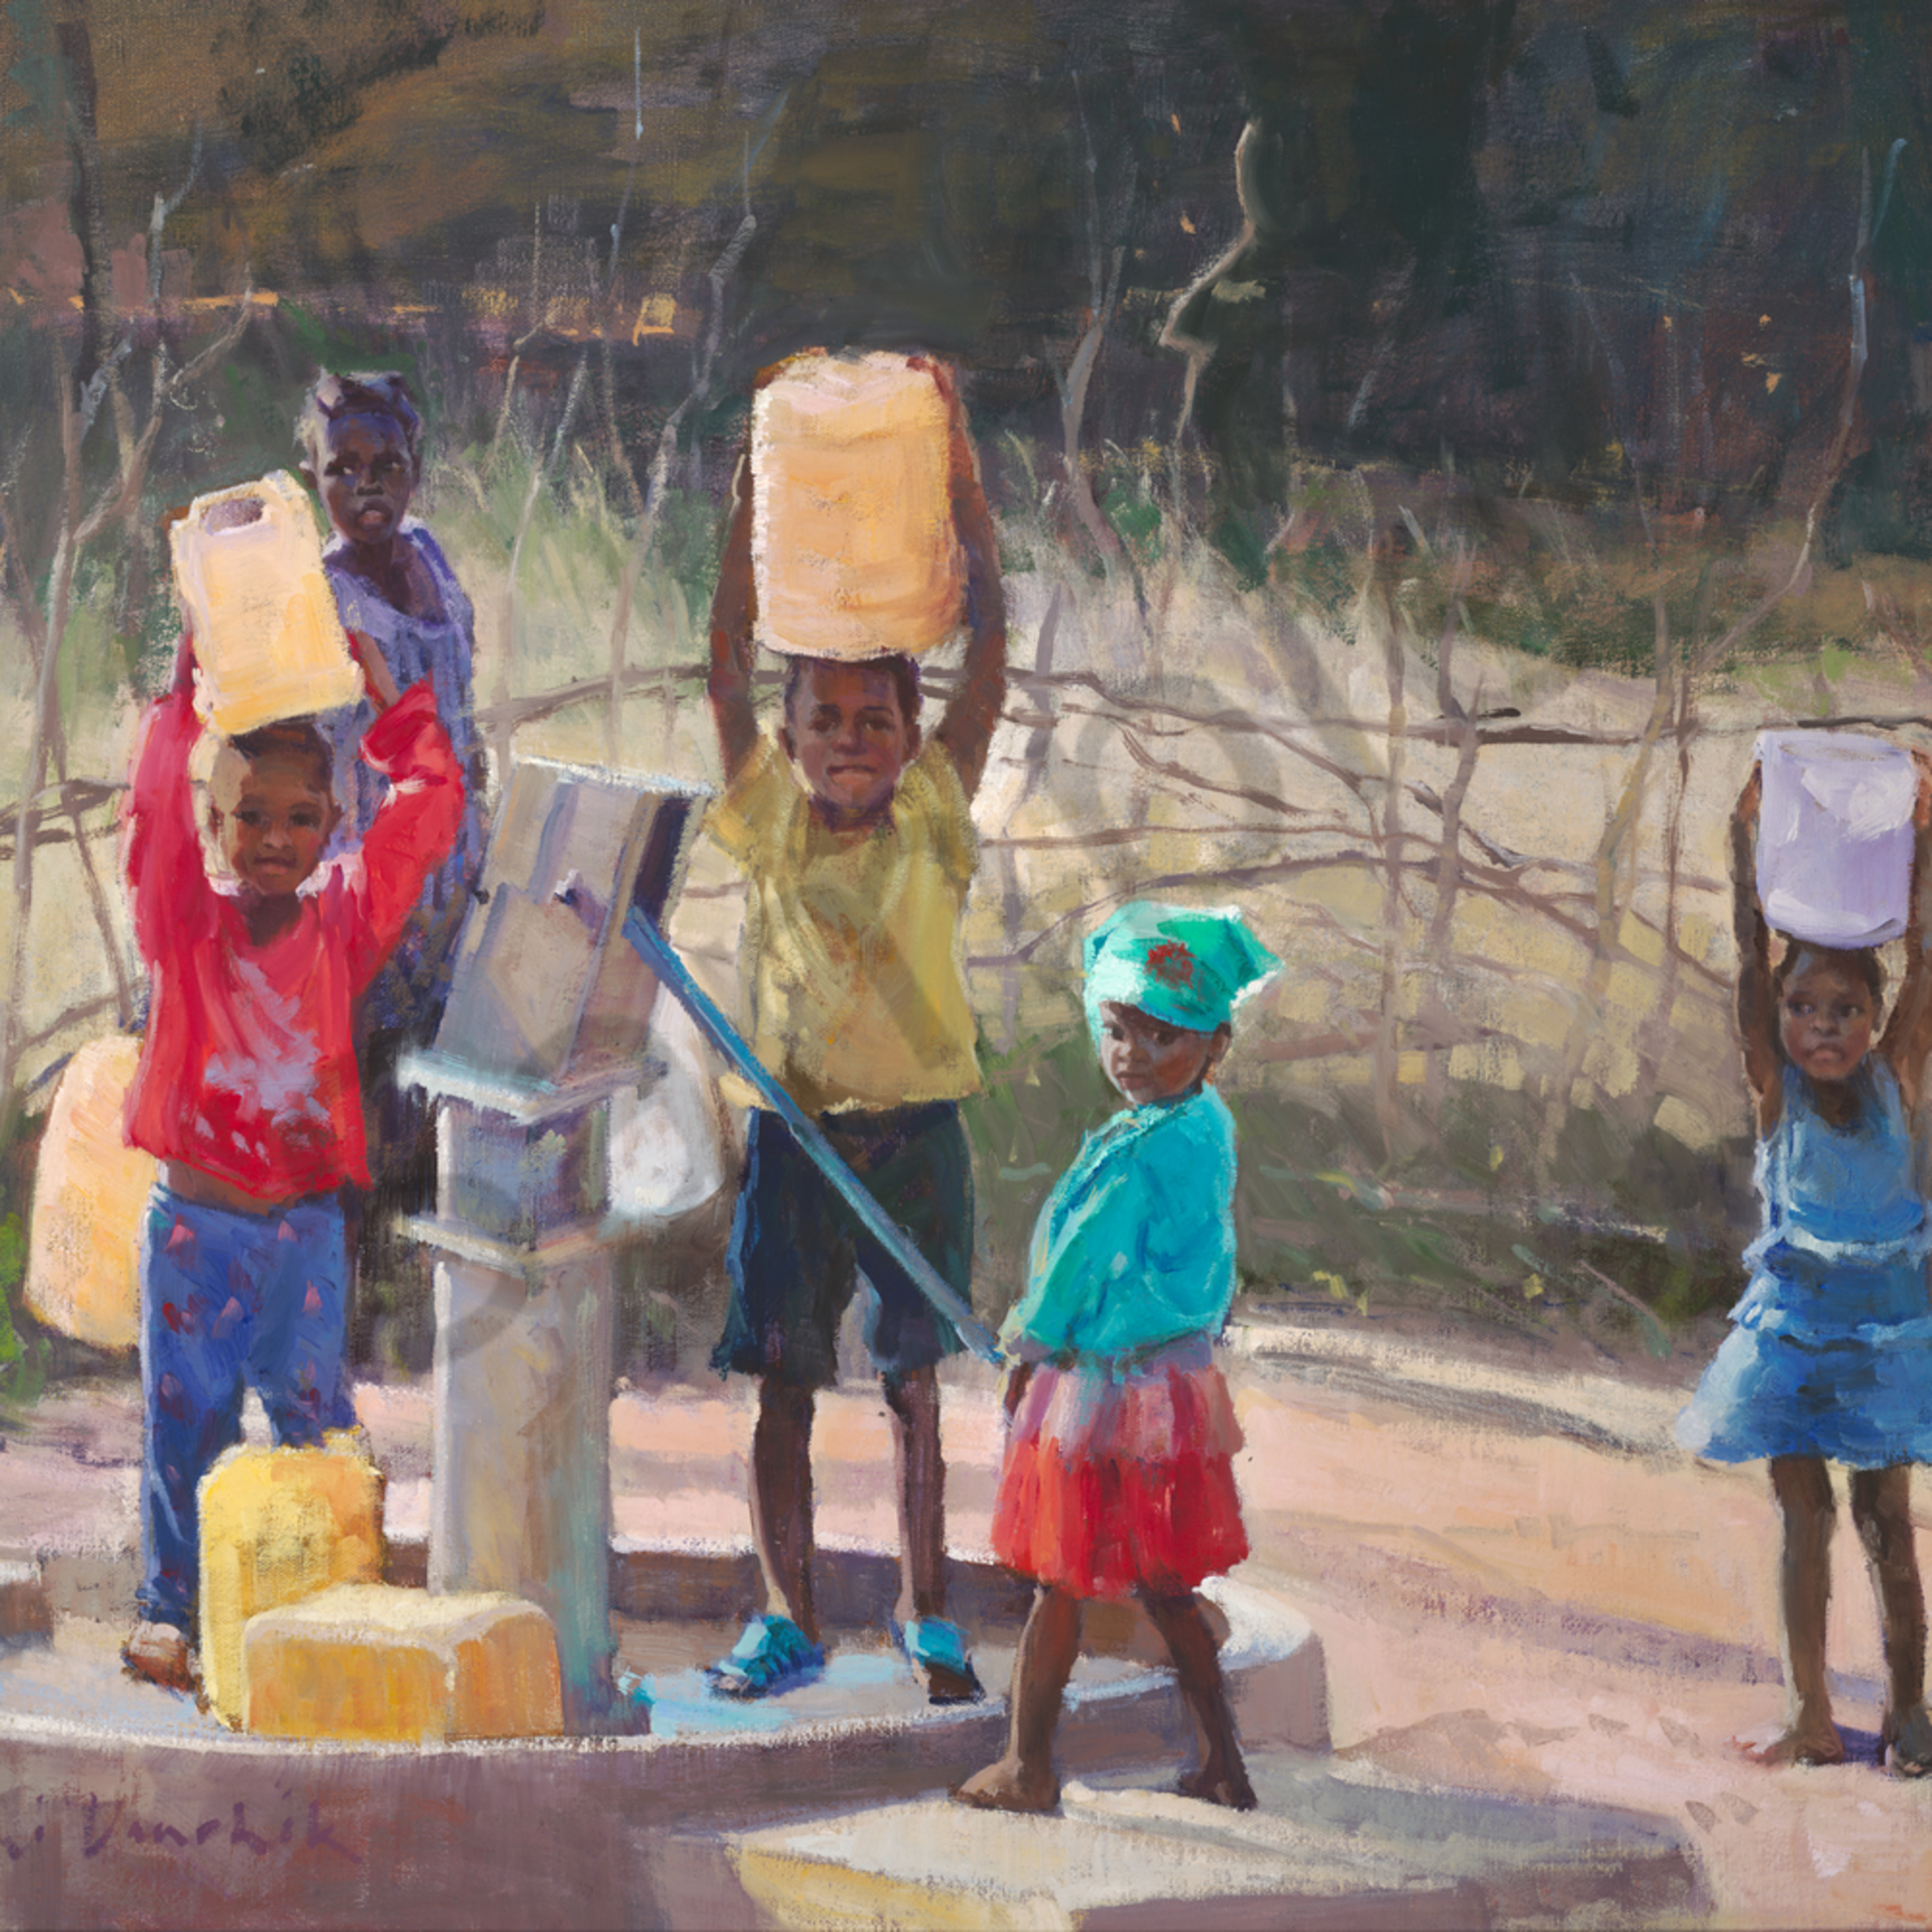 Danchik 2 3 7 17 give the children water 24 x 30 asf fgplna